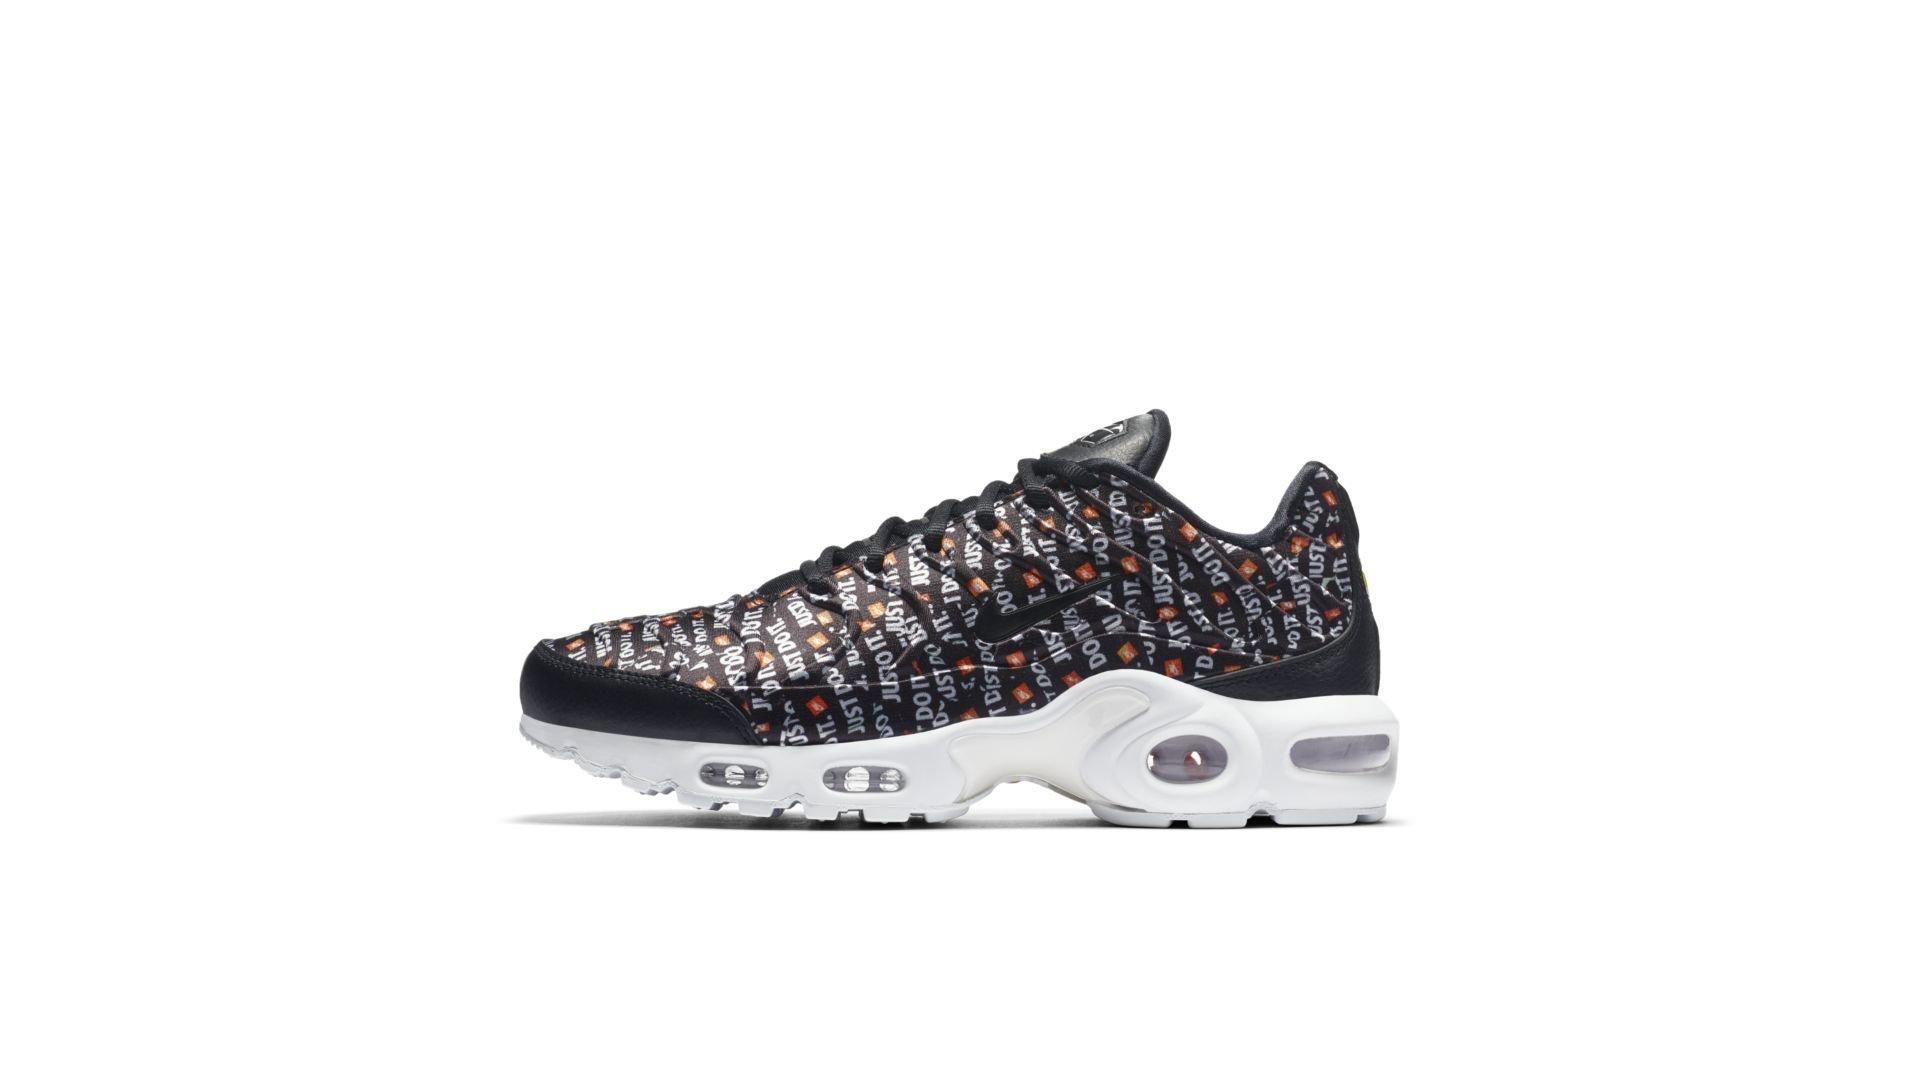 Nike Wmns Air Max Plus SE 'Black' (862201-007)